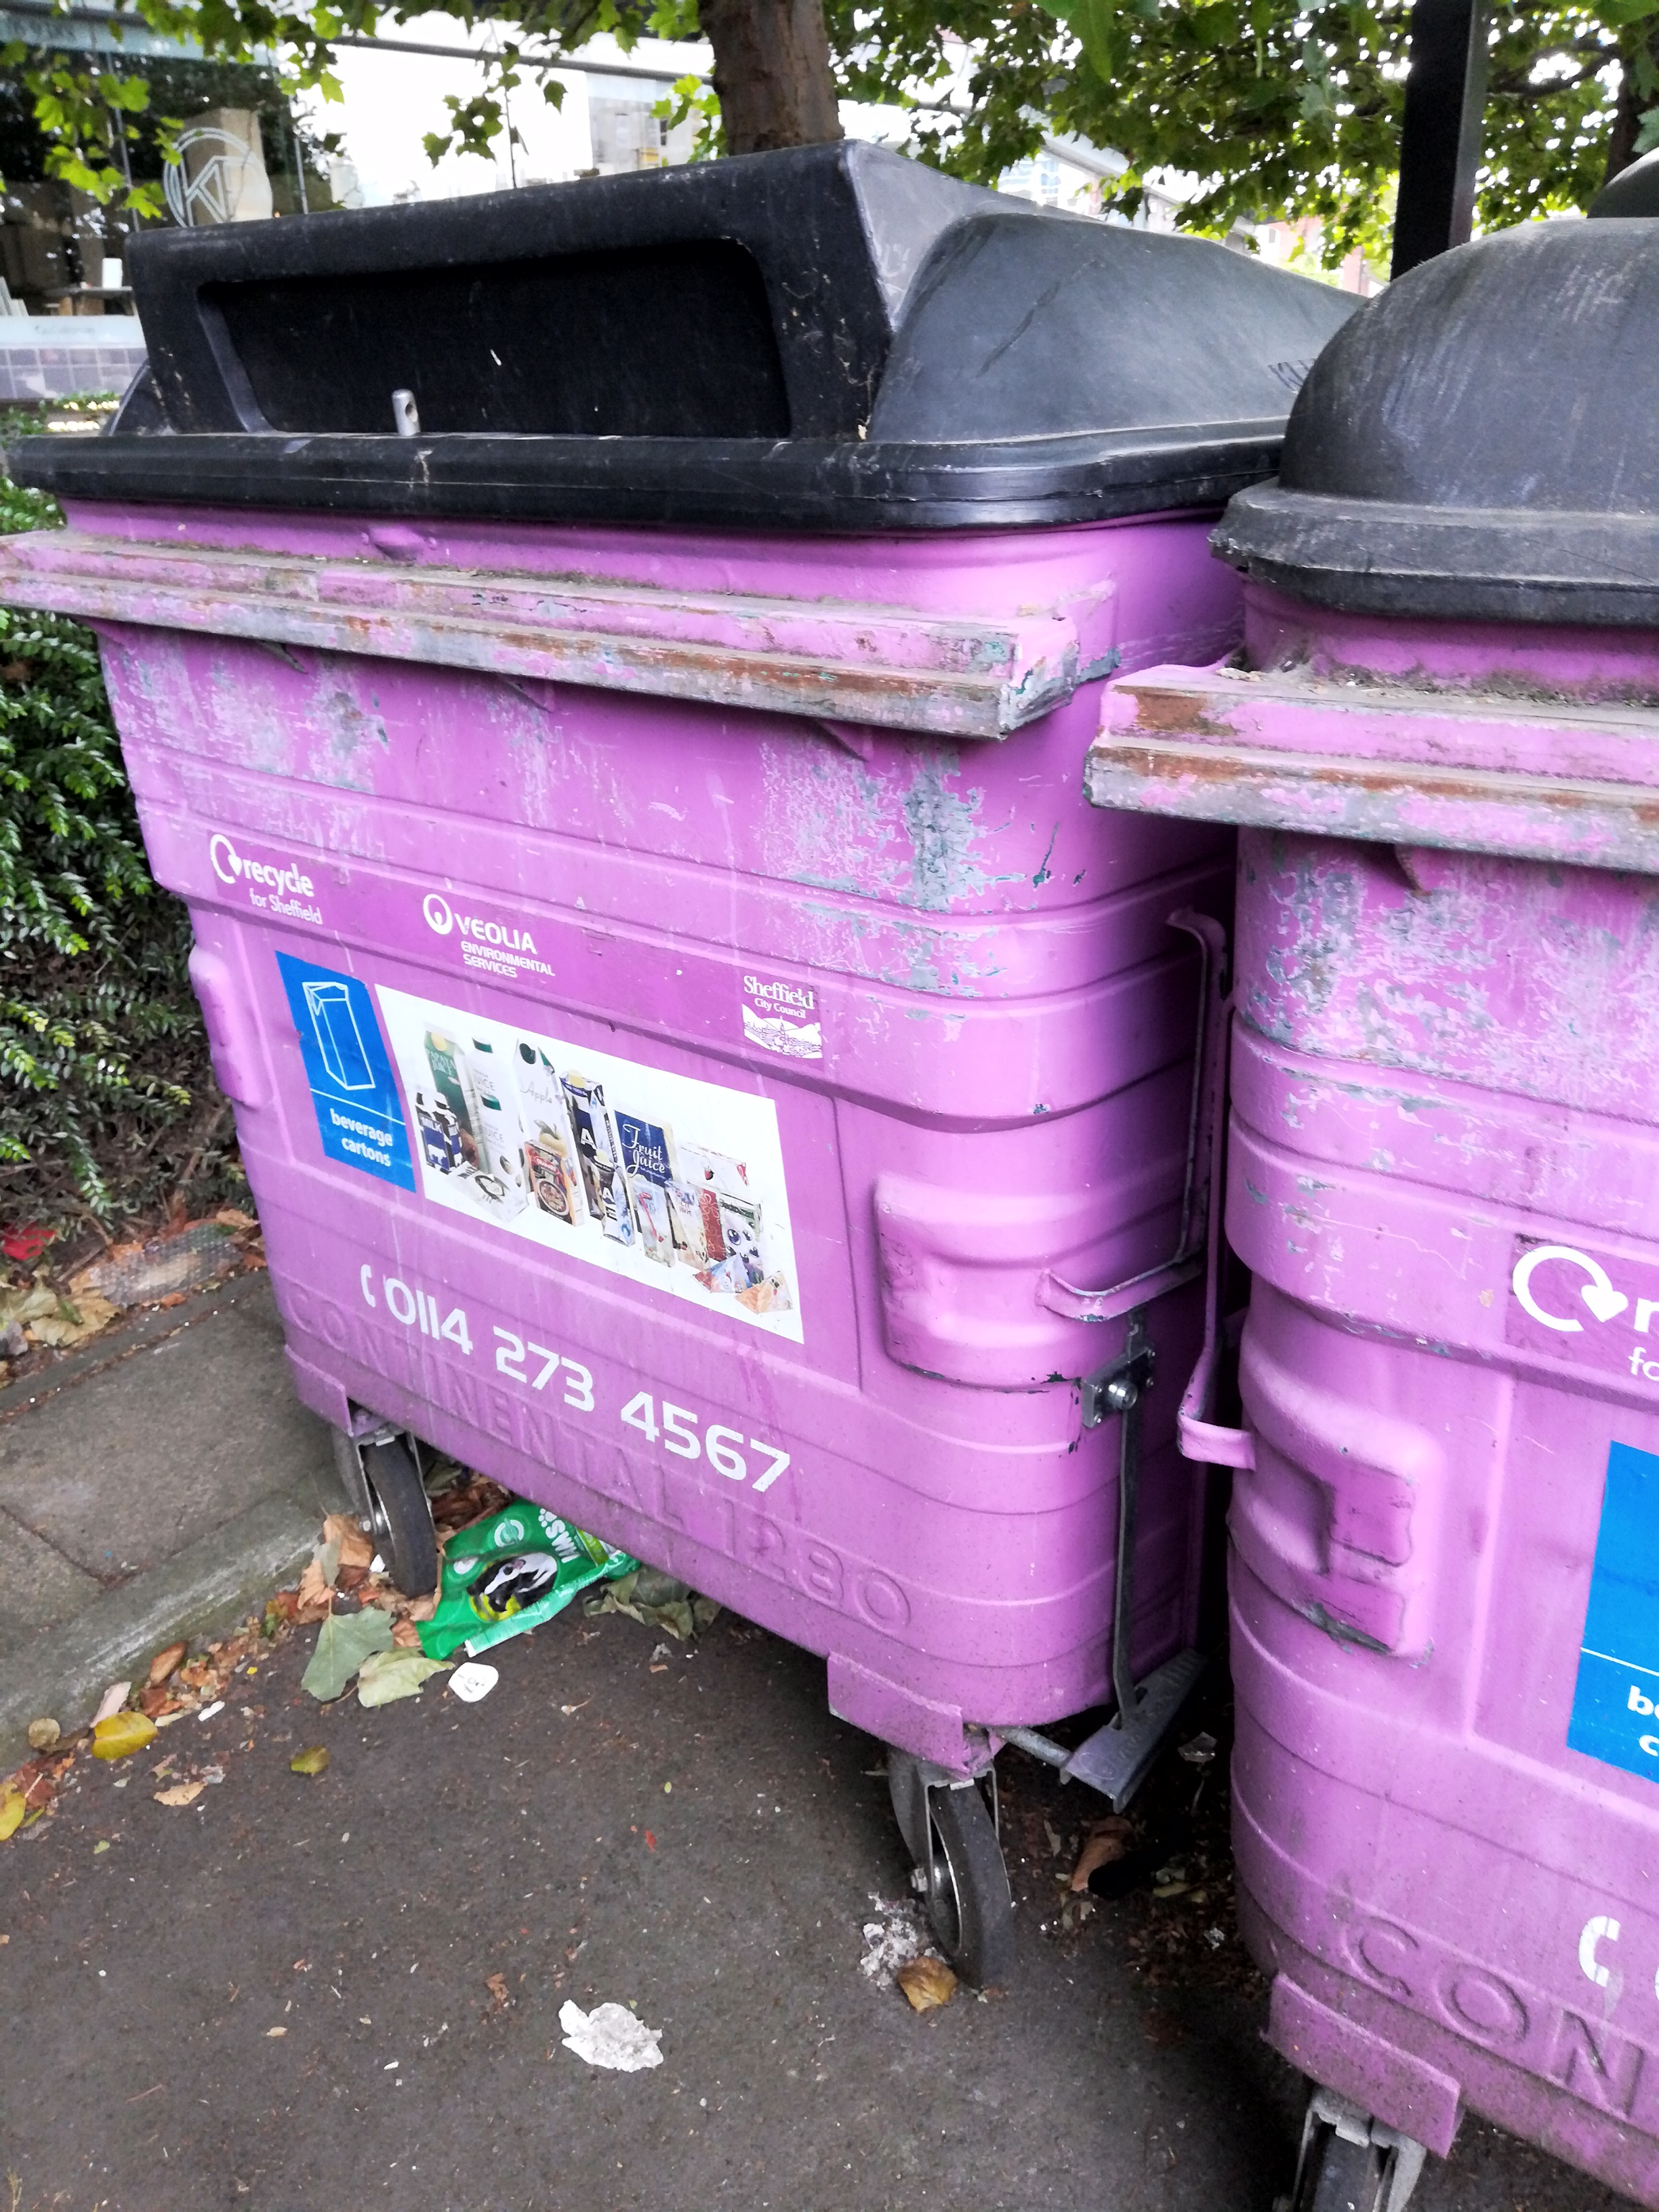 Tetra Pak recycling bins